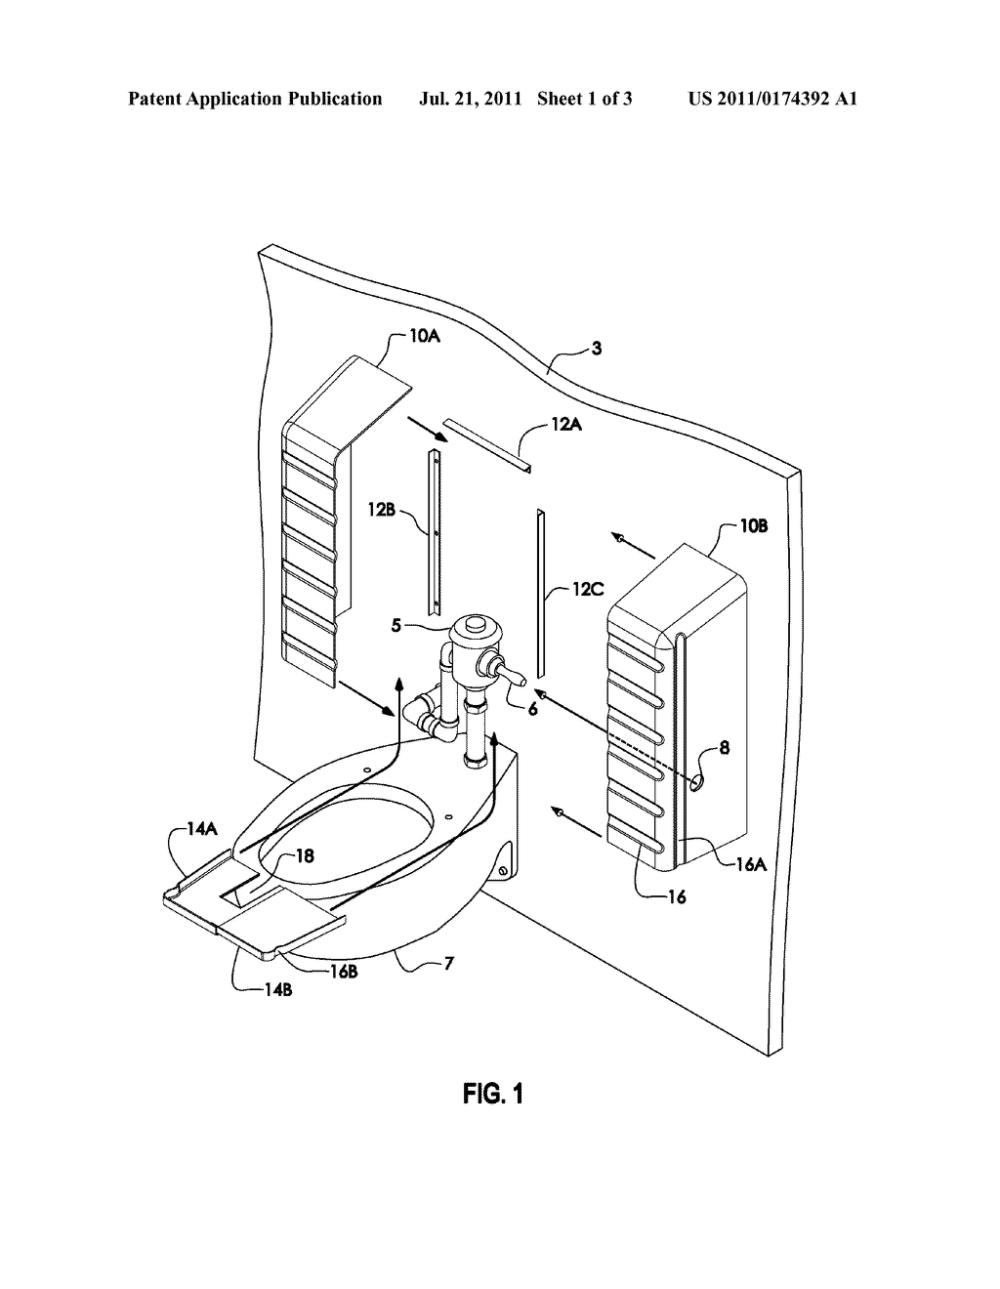 medium resolution of adaptable shroud for toilet plumbing riser diagram schematic and image 02